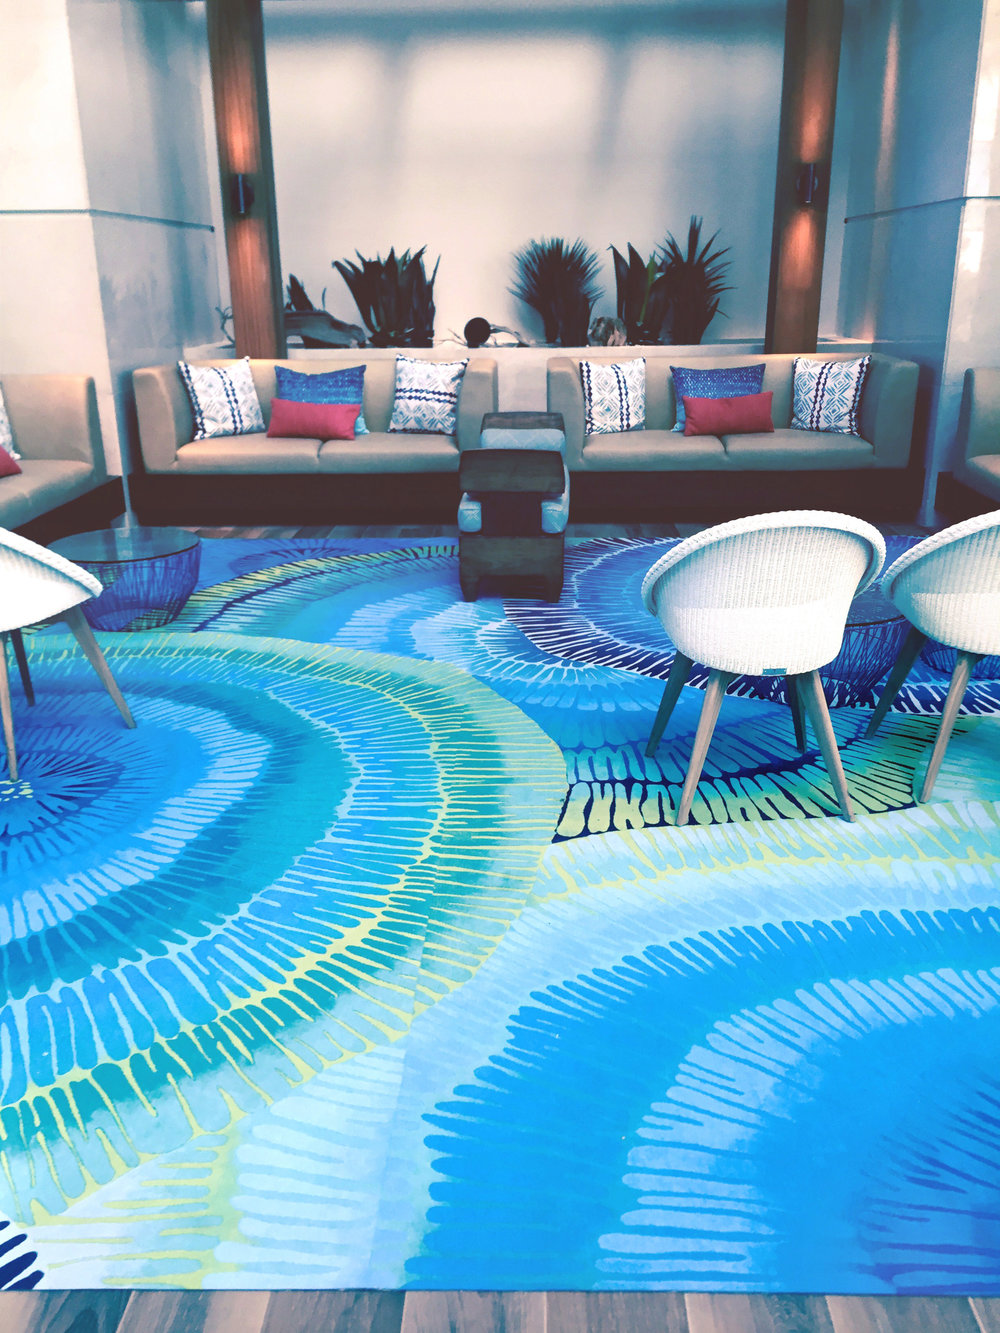 Diplomat Hotel - Hollywood, FL